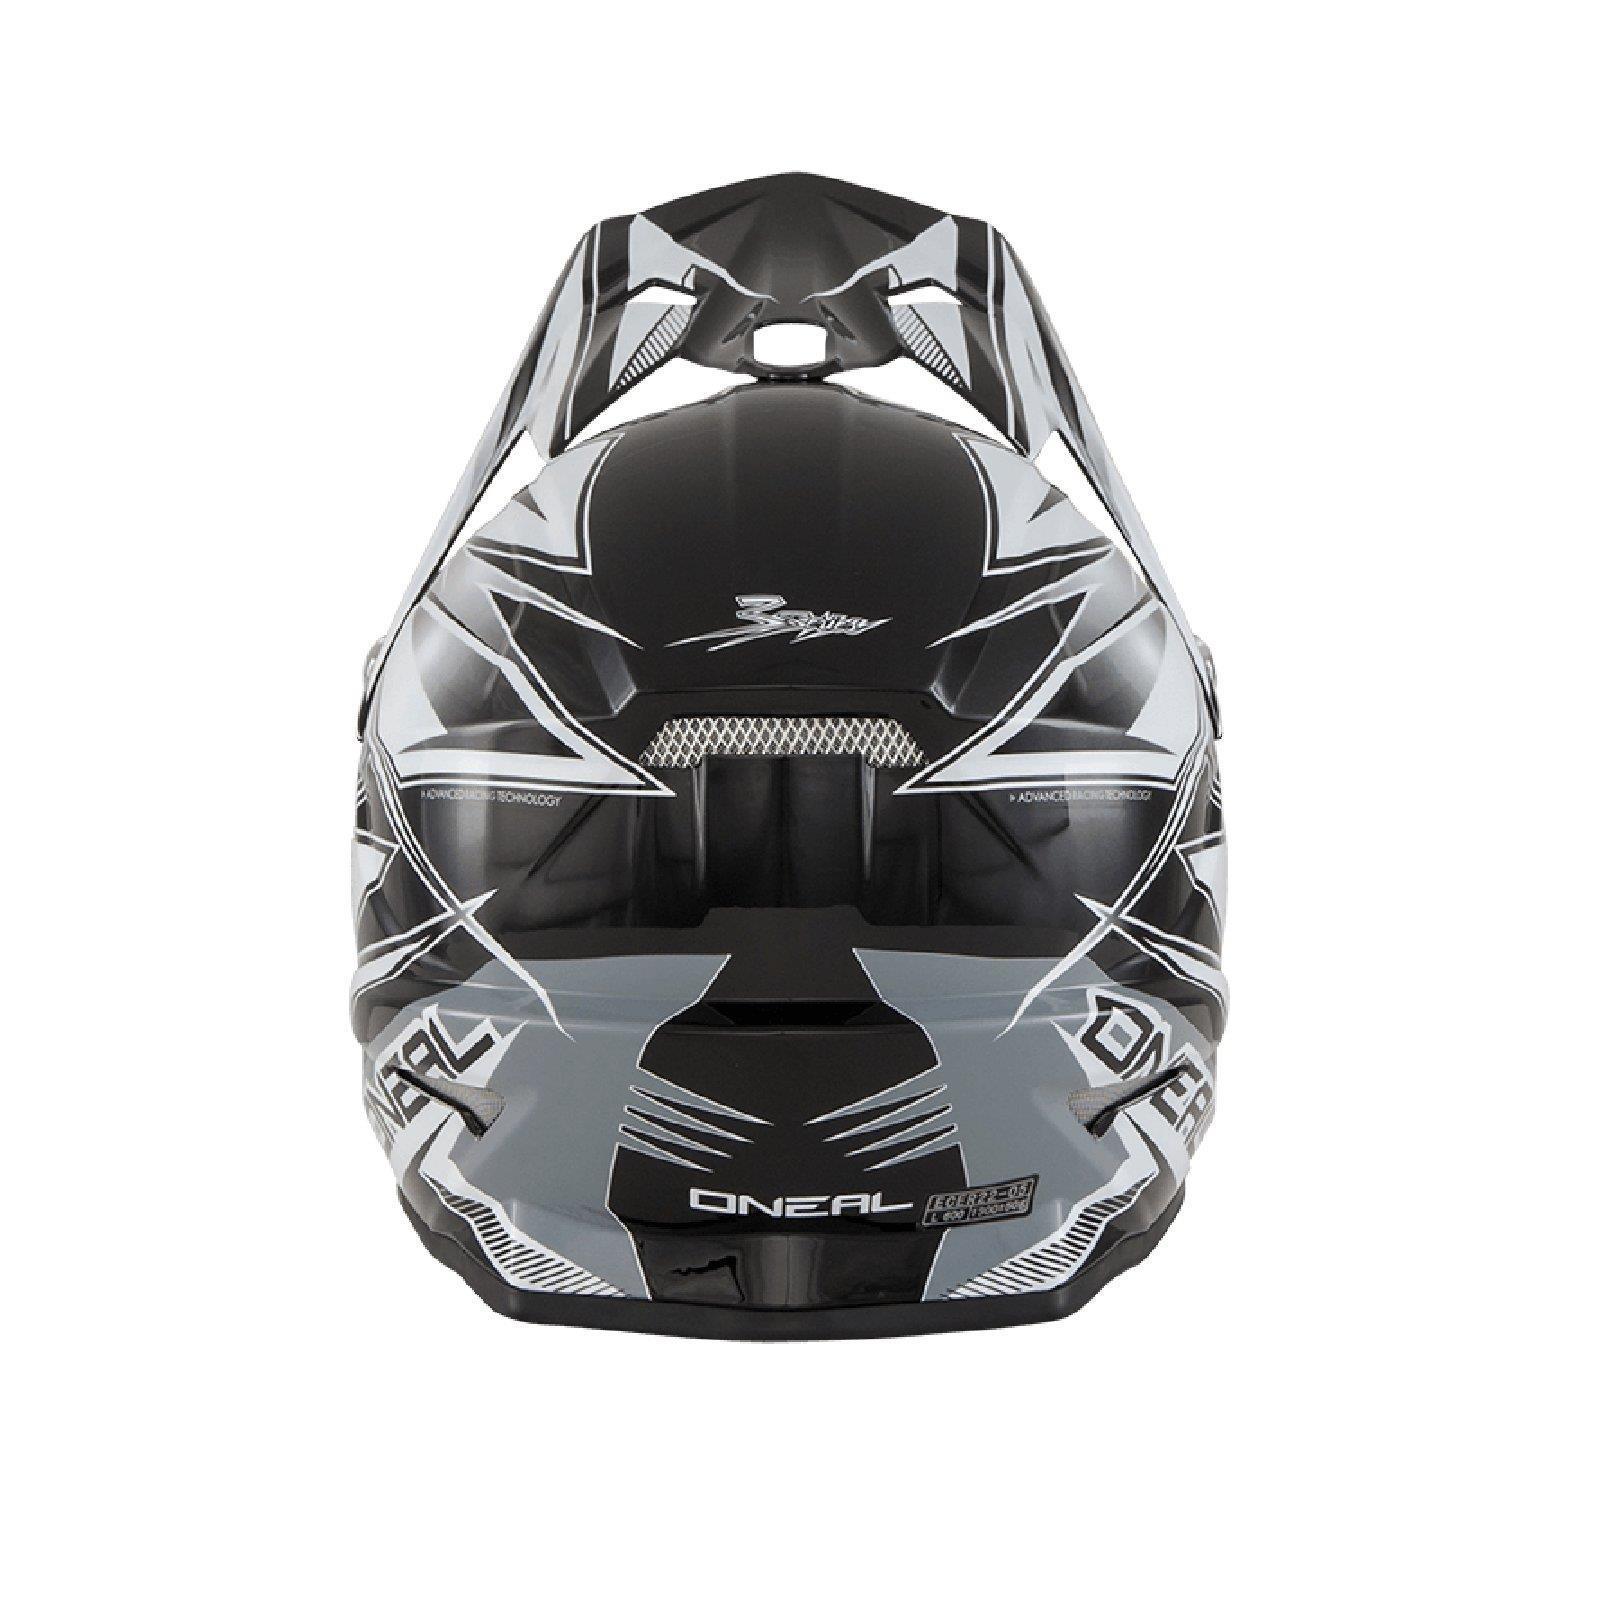 ONeal-Motocross-casco-MX-ENDURO-MOTO-BICI-FUORISTRADA-CROSS-Series-Adventure miniatura 118